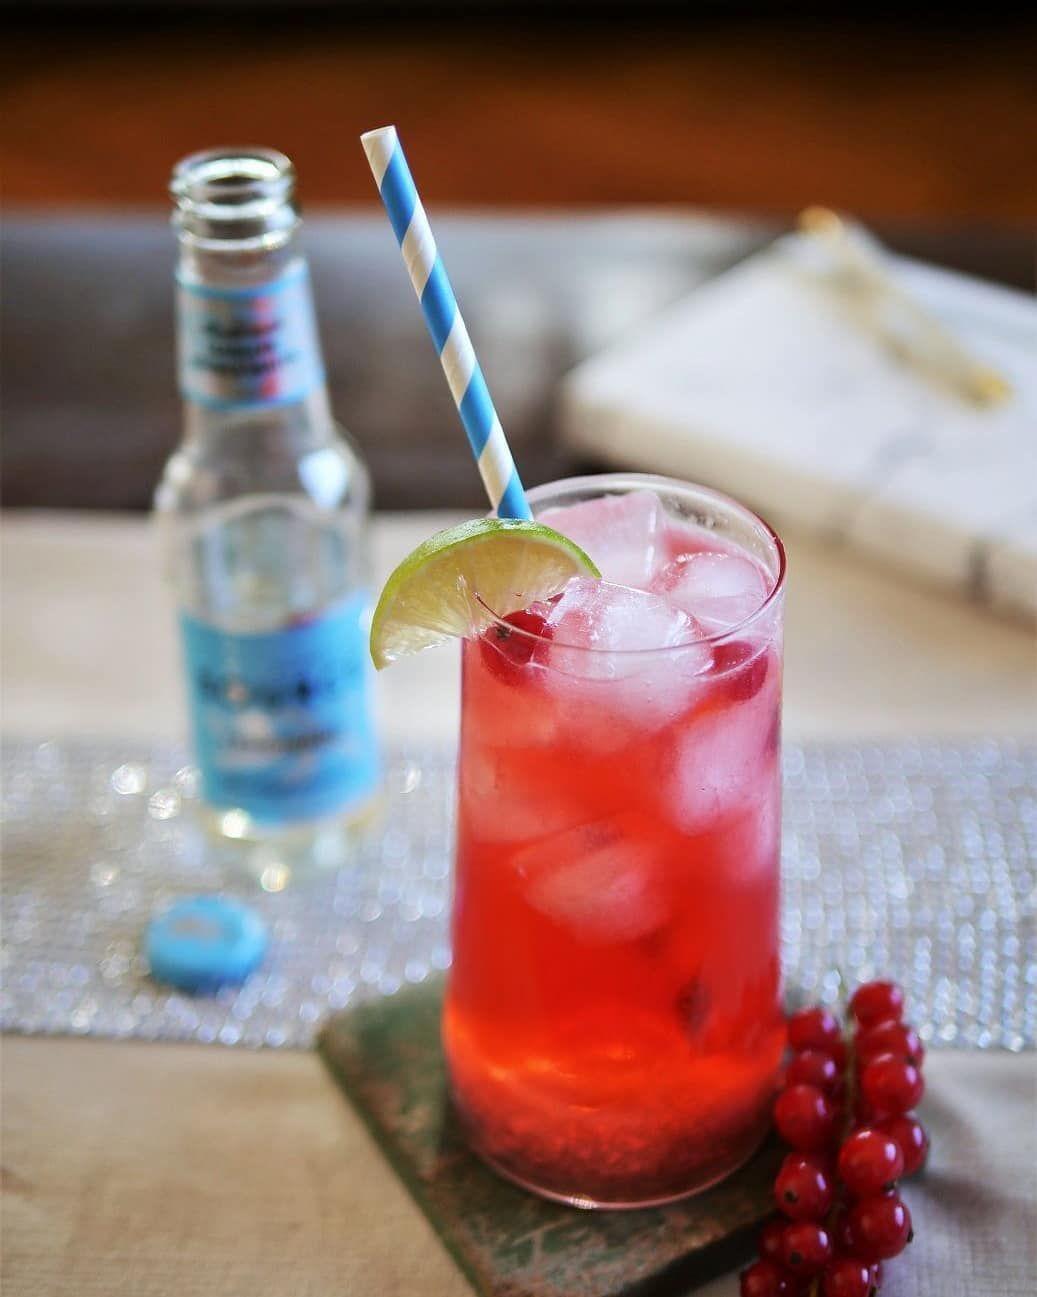 Inka Larissa On Instagram Making Plans For 2019 Whilst Sipping A Mocktail Who Am I Seriously Speaking I Had Som Mocktails Mocktail Recipe Vodka Shots